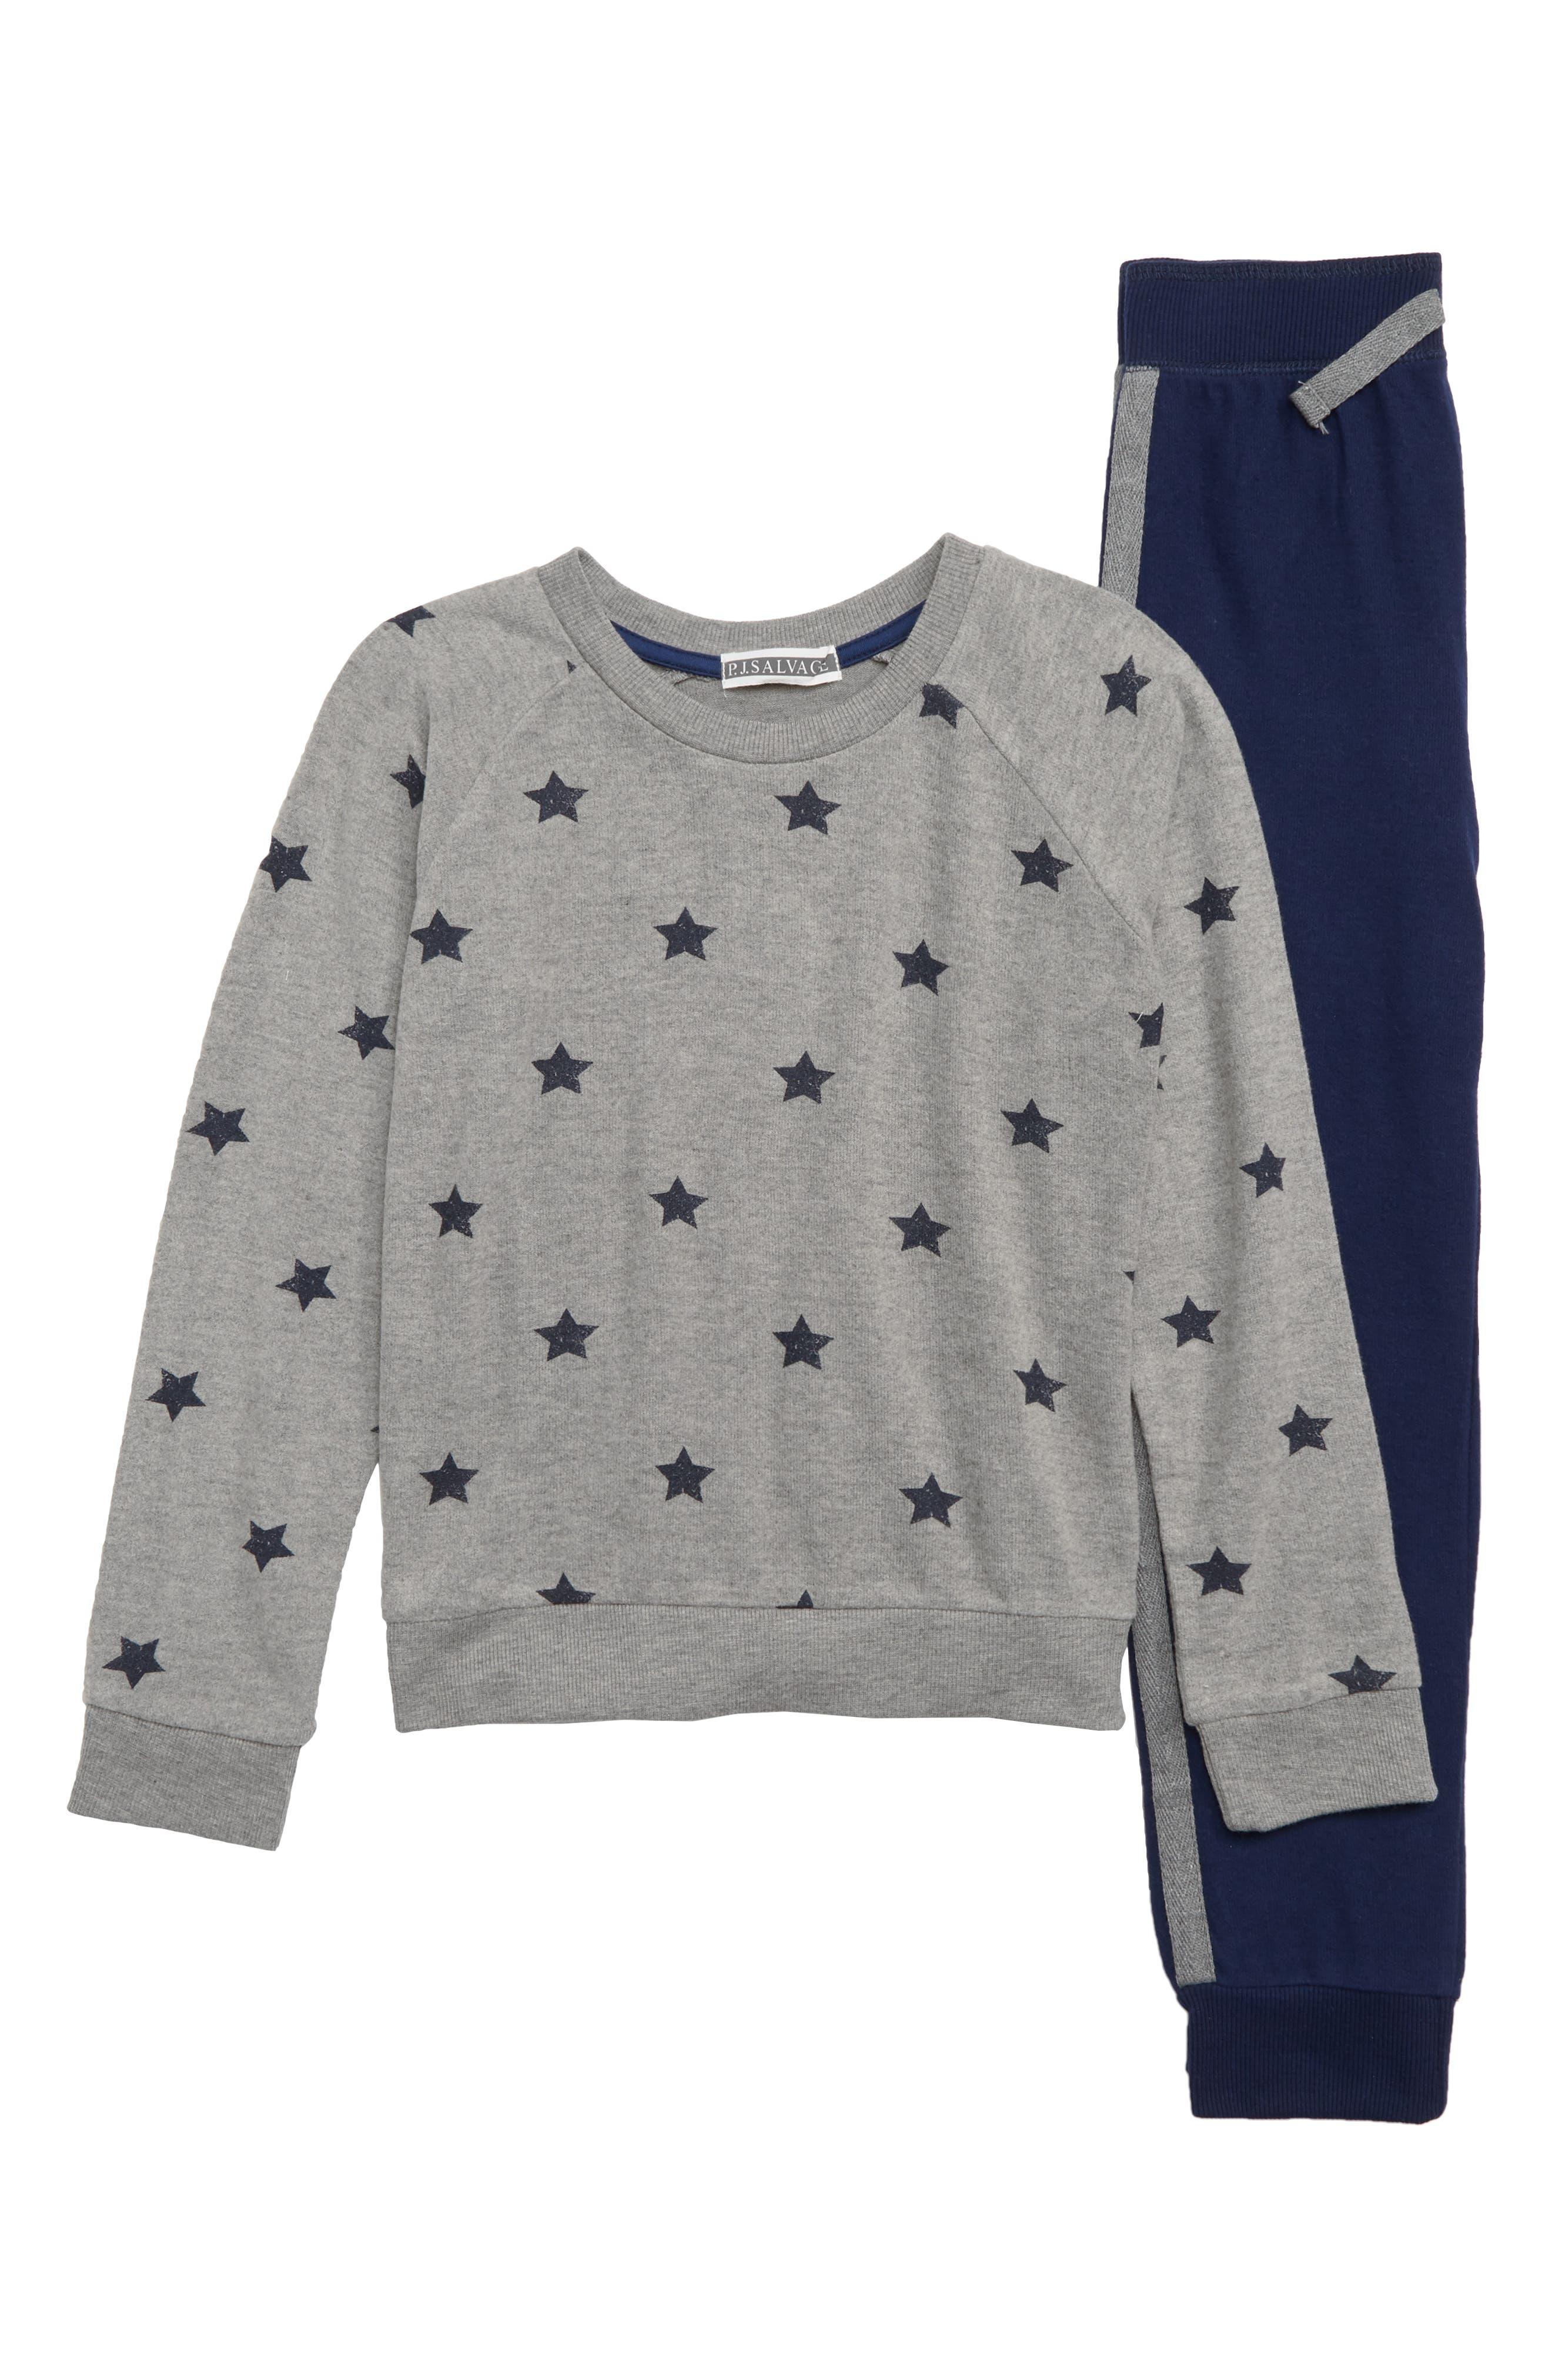 Super Star Two-Piece Pajamas,                         Main,                         color, NAVY